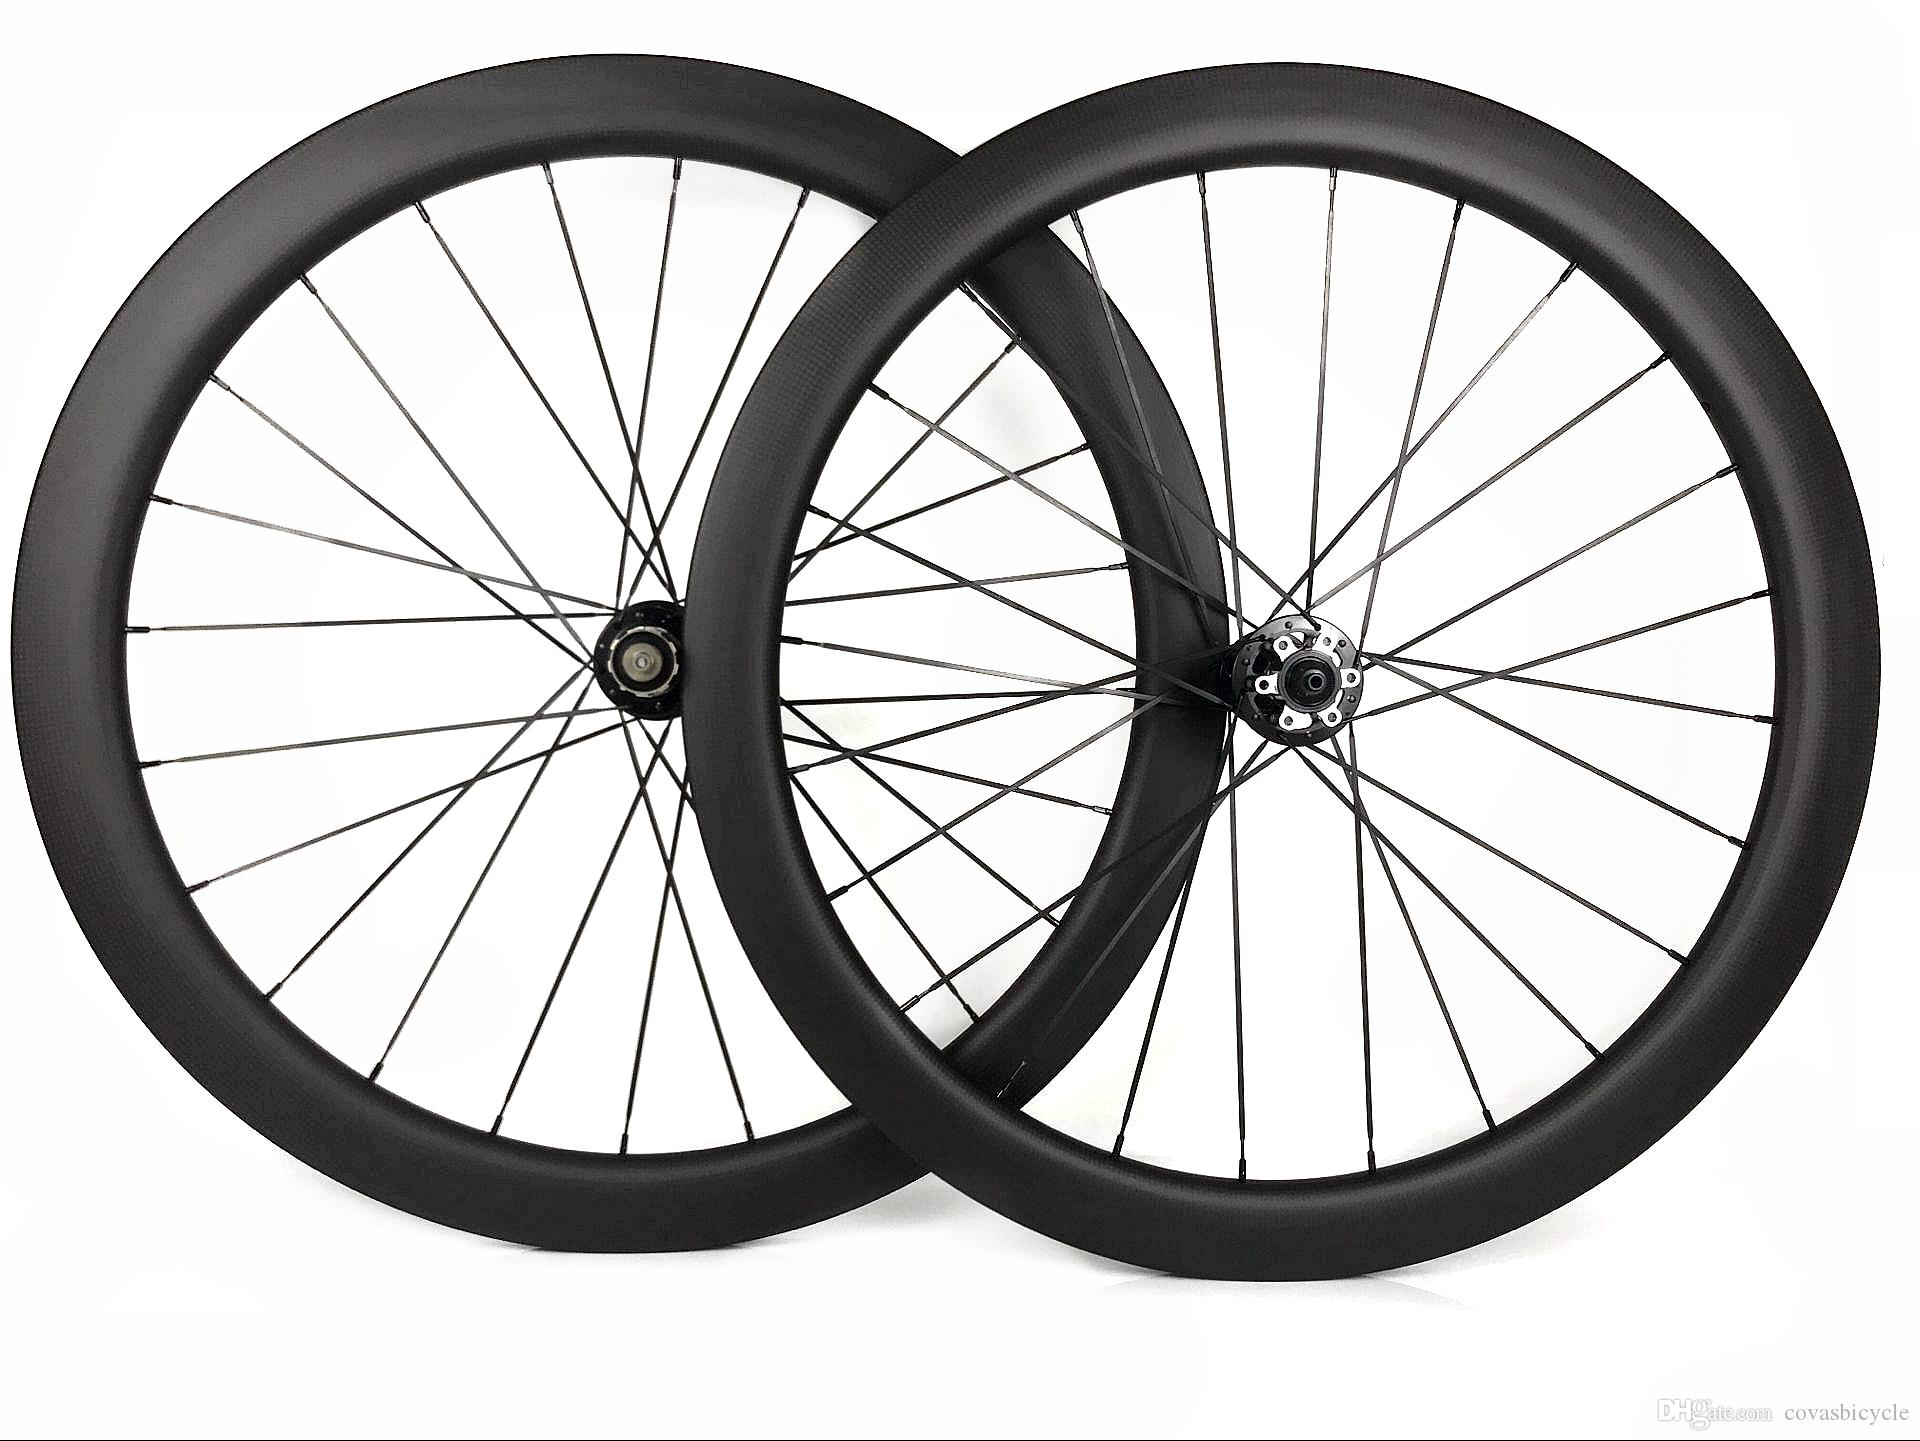 700c 60 ملليمتر عمق الطريق قرص الفرامل عجلات الكربون 25 ملليمتر عرض الدراجة الفاصلة / الكربون أنبوبي العجلات 3 كيلو ماتي النهاية ، u- شكل حافة